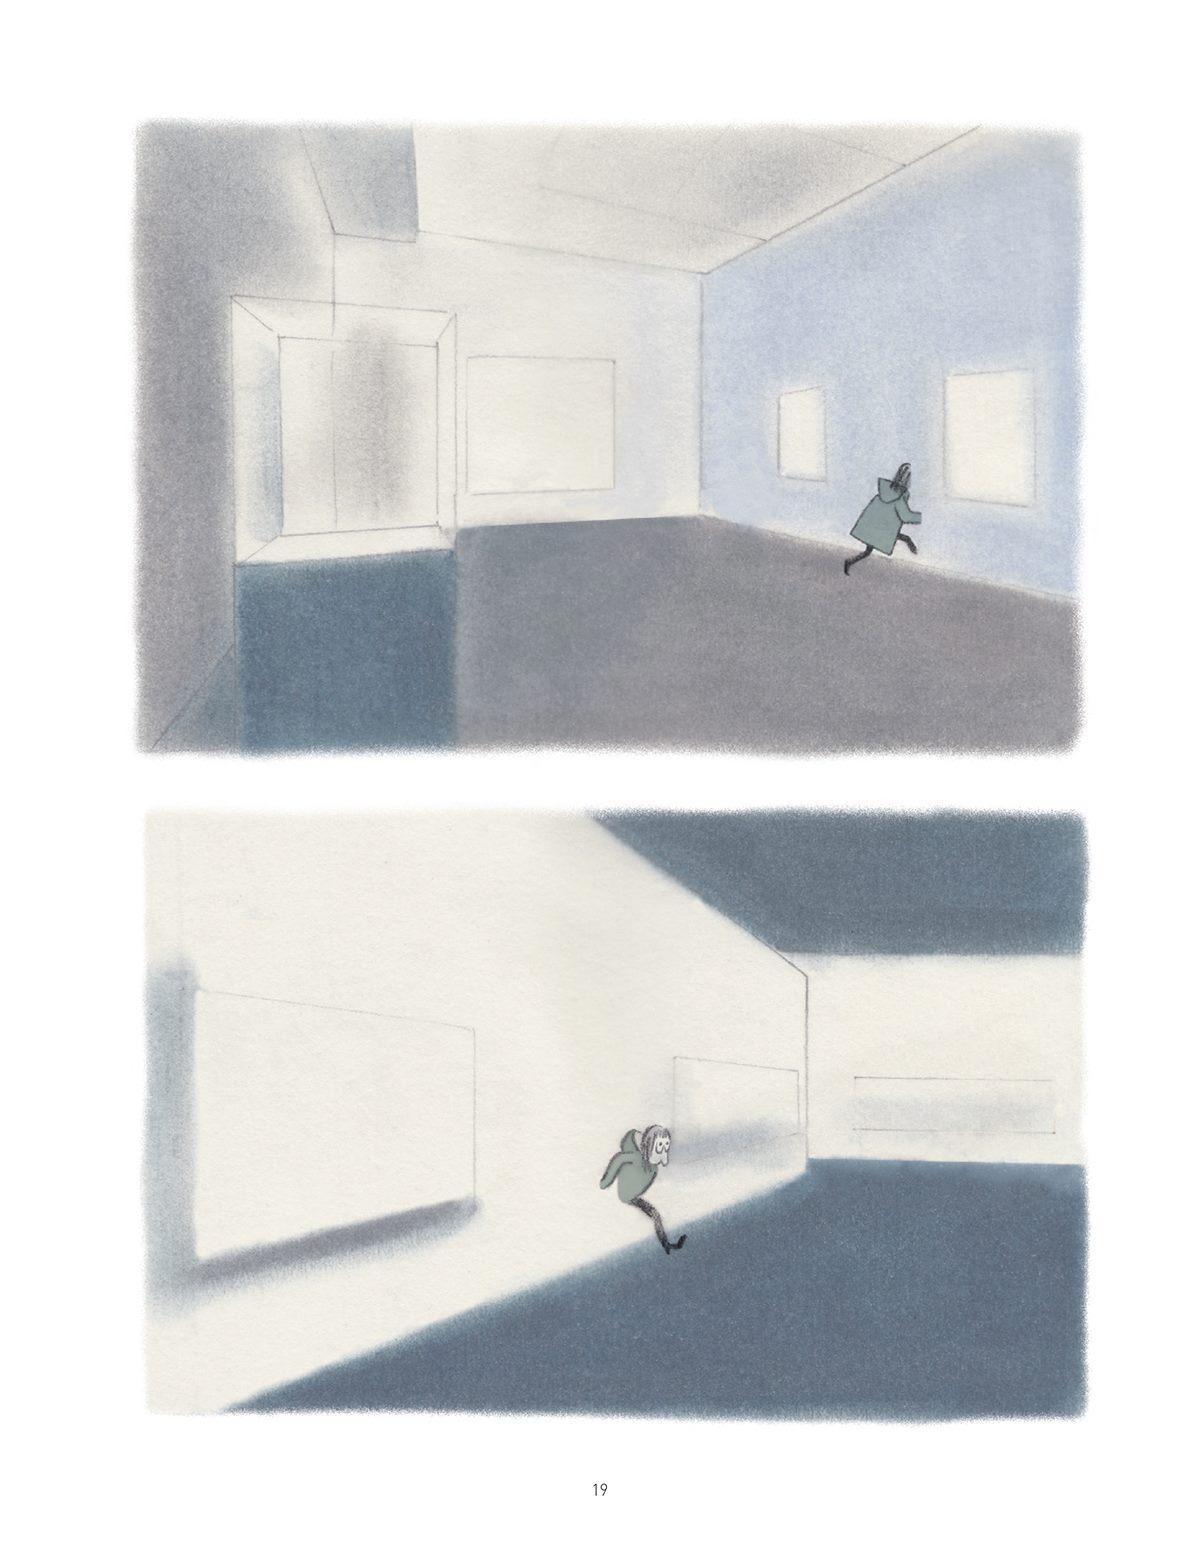 La legerete - Catherine Meurisse - Disparaitre